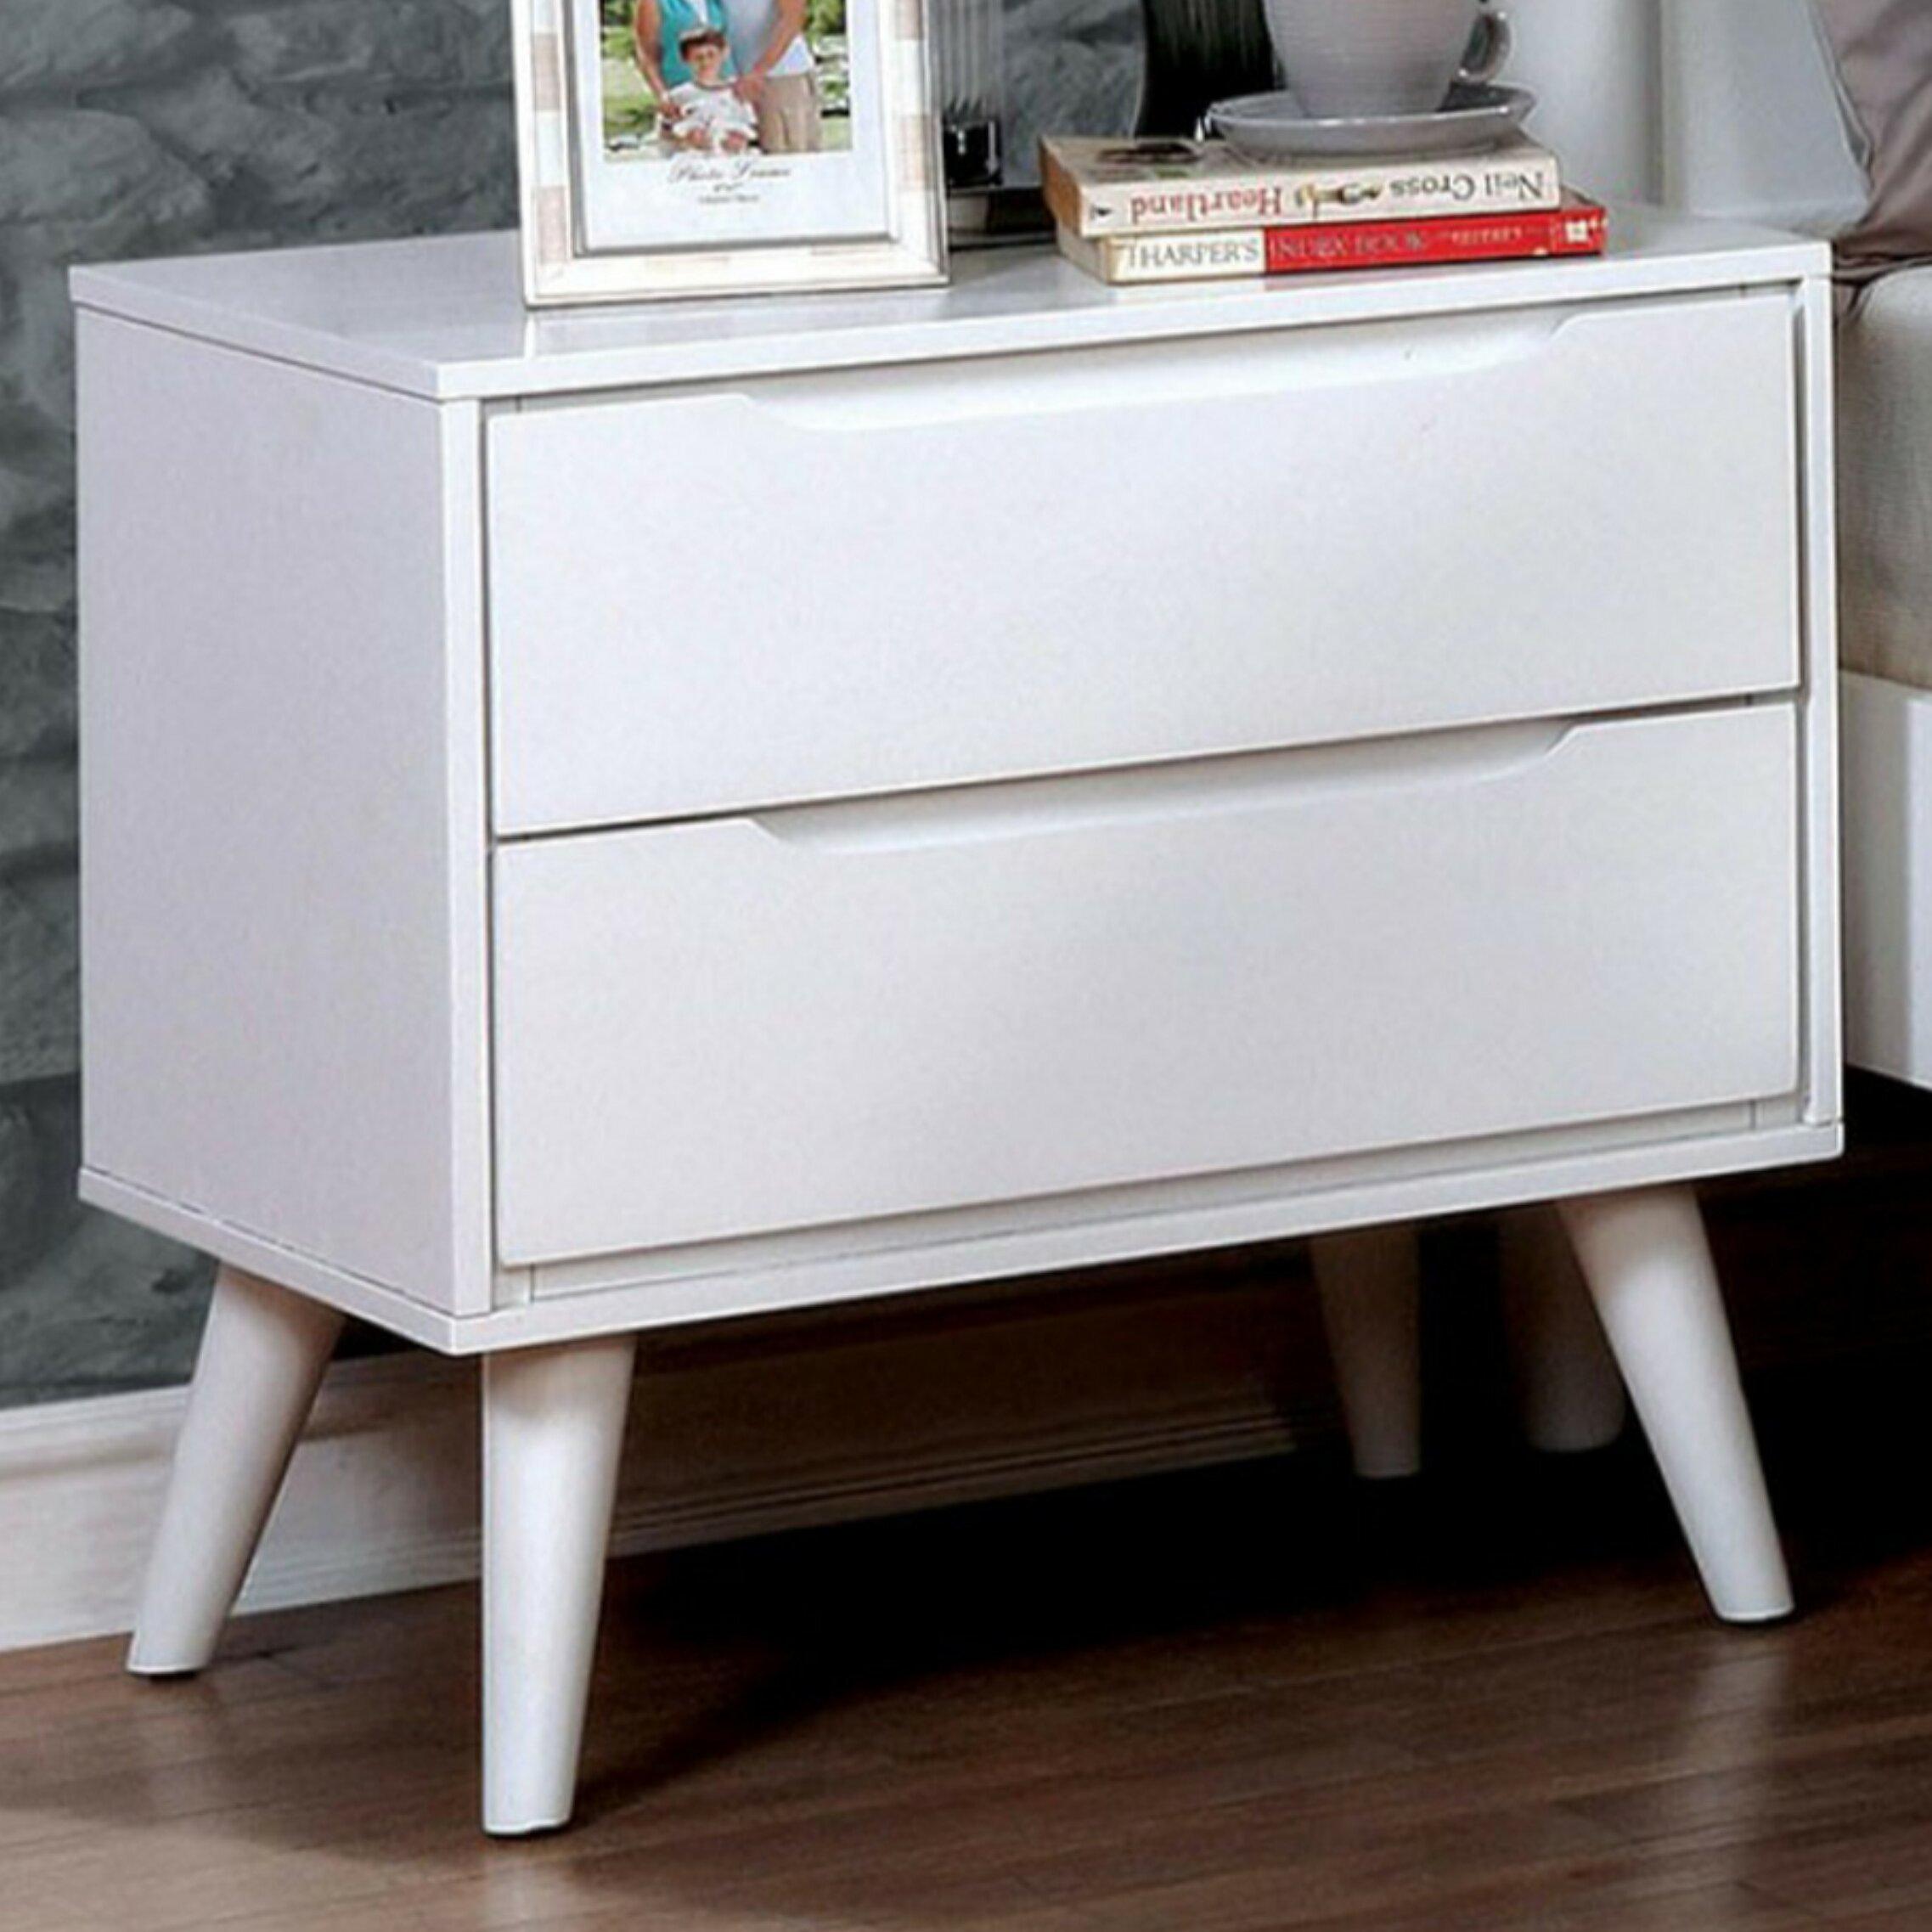 Fantastic Ian Mid Century 2 Drawer Nightstand Spiritservingveterans Wood Chair Design Ideas Spiritservingveteransorg